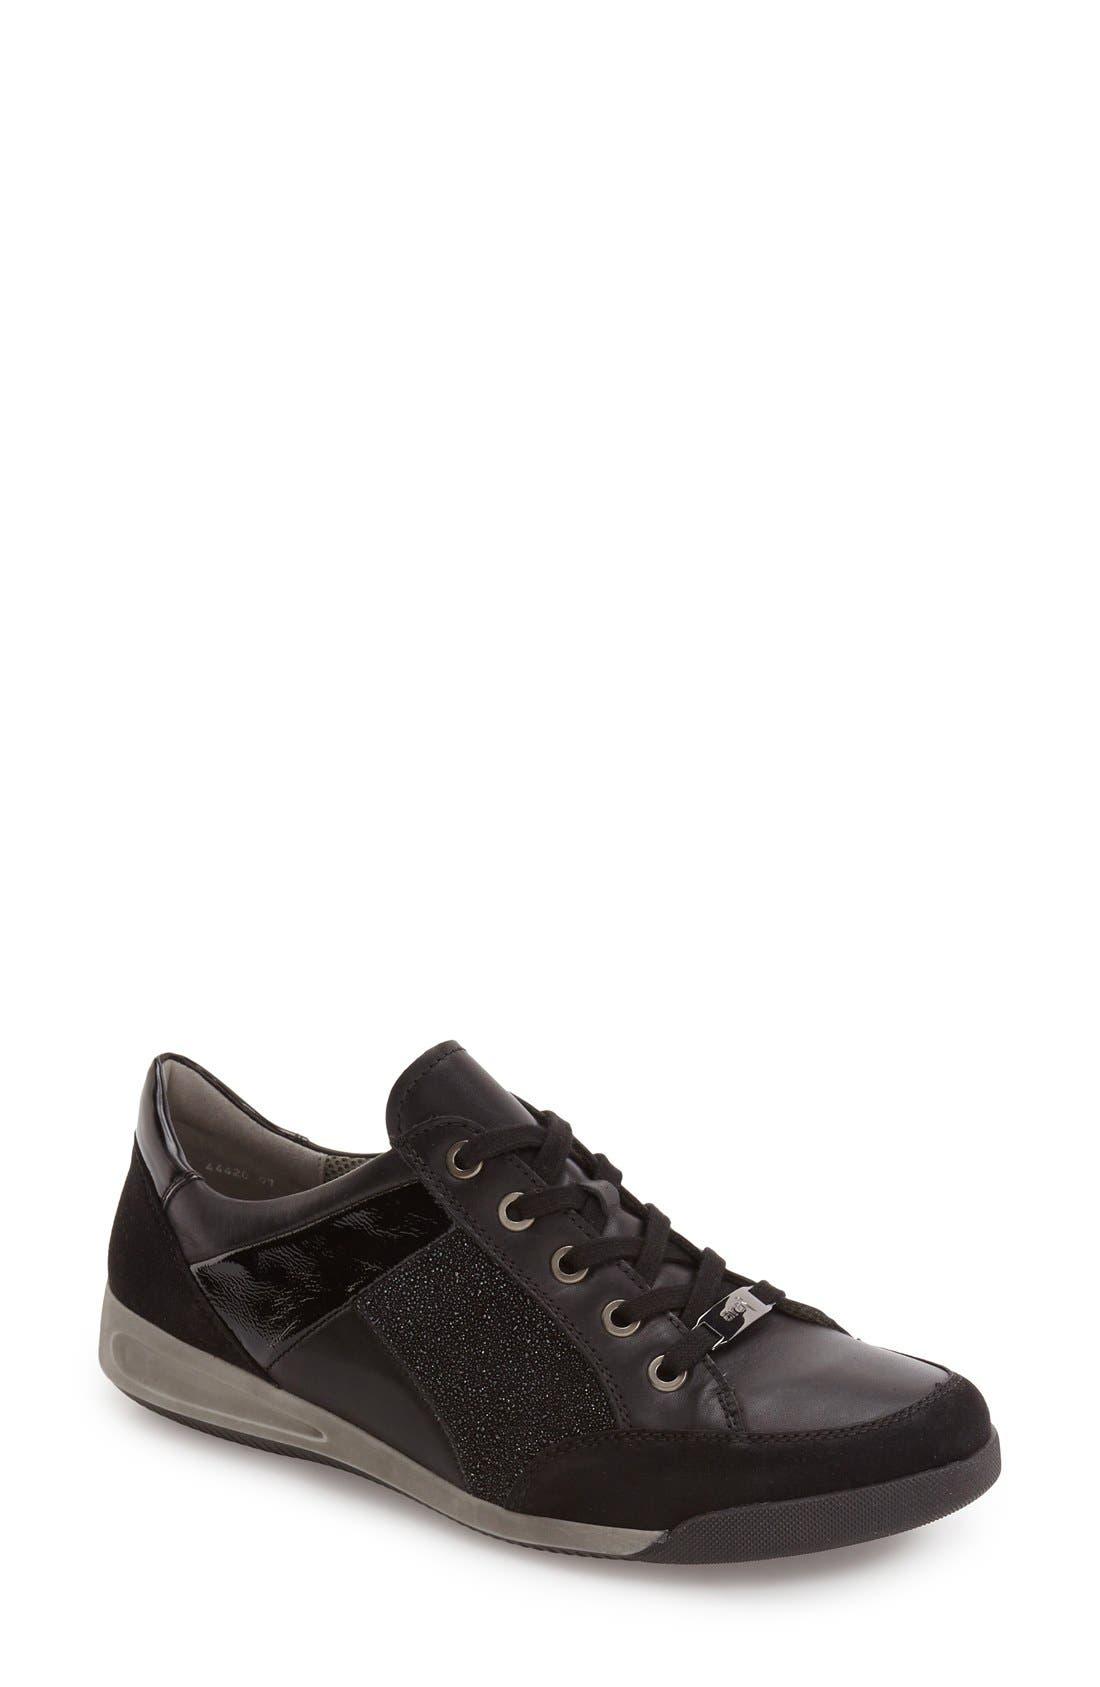 Rina Sneaker,                         Main,                         color, BLACK SUEDE